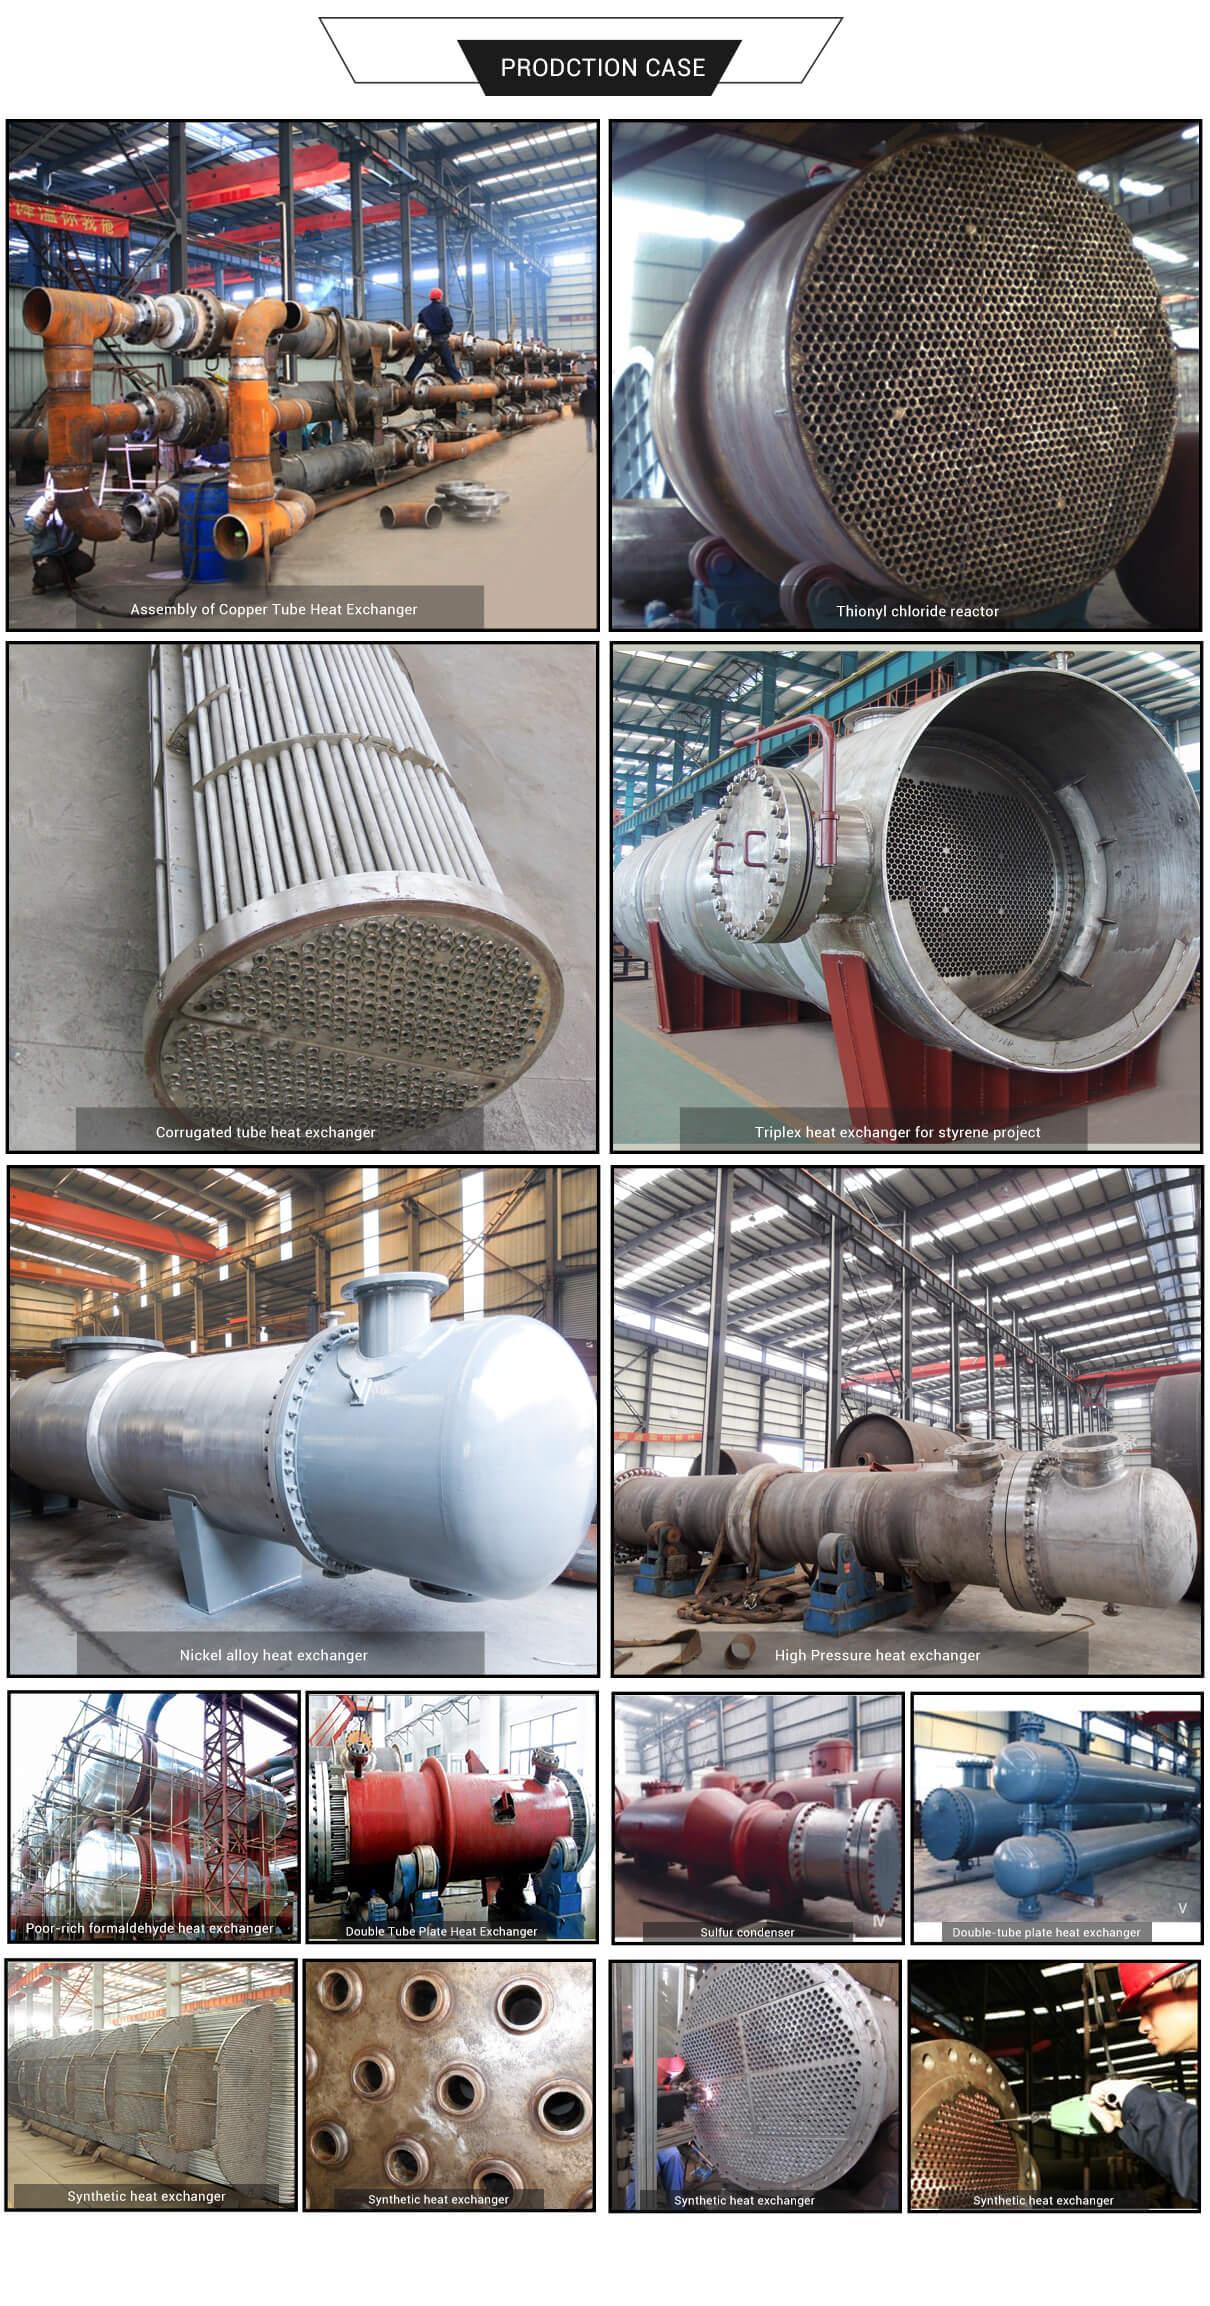 heat exchanger case